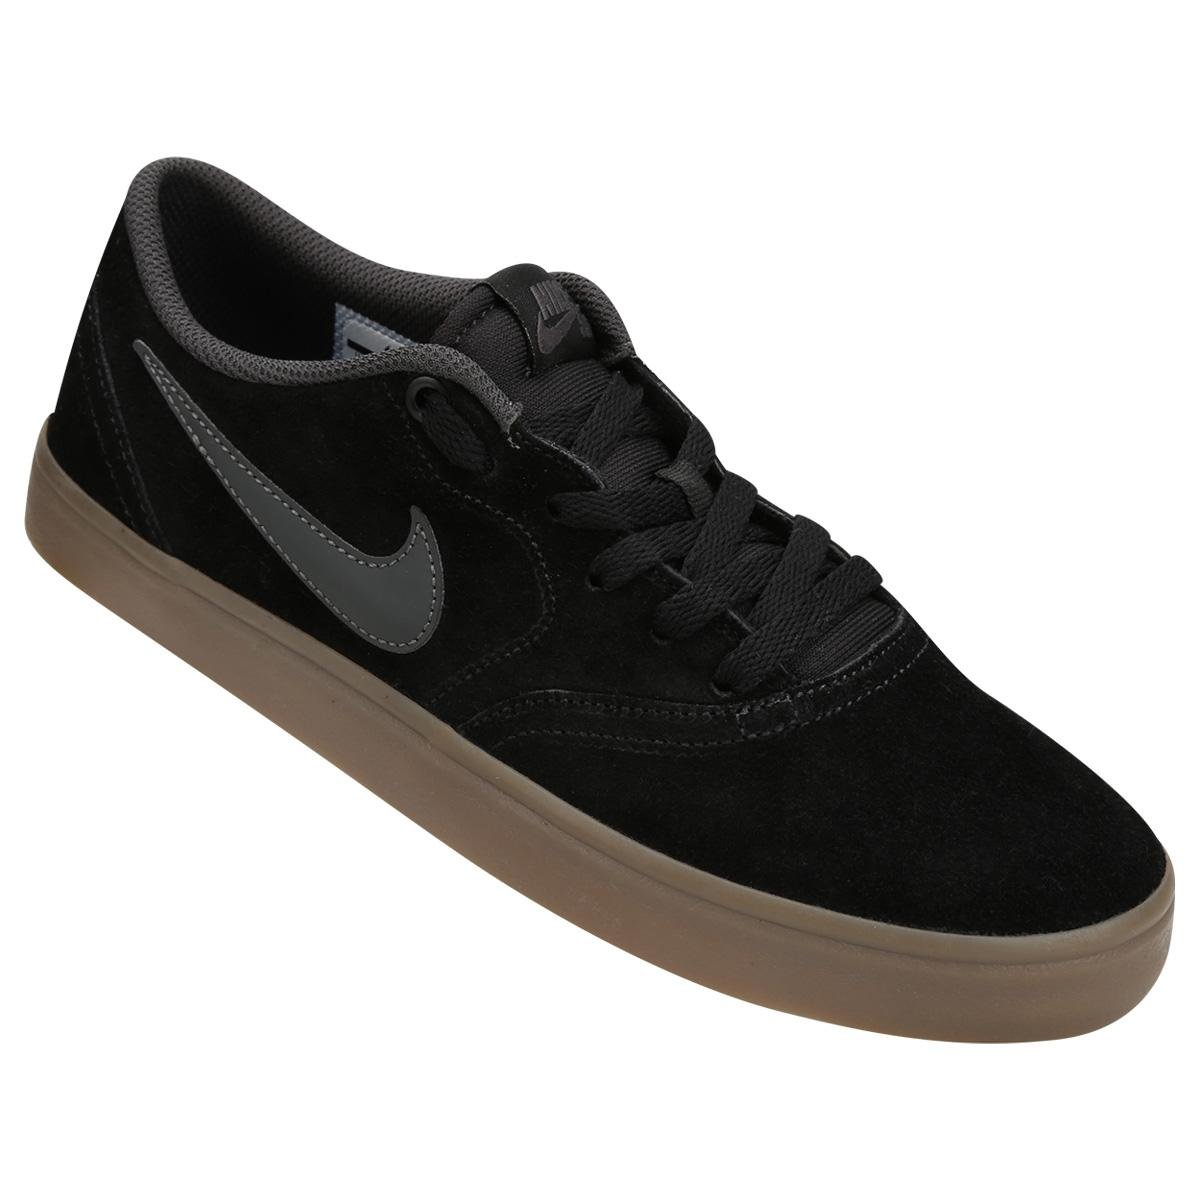 Tênis Nike Sb Check Solar Masculino - Preto e Marrom - Compre Agora ... 7d80c268036